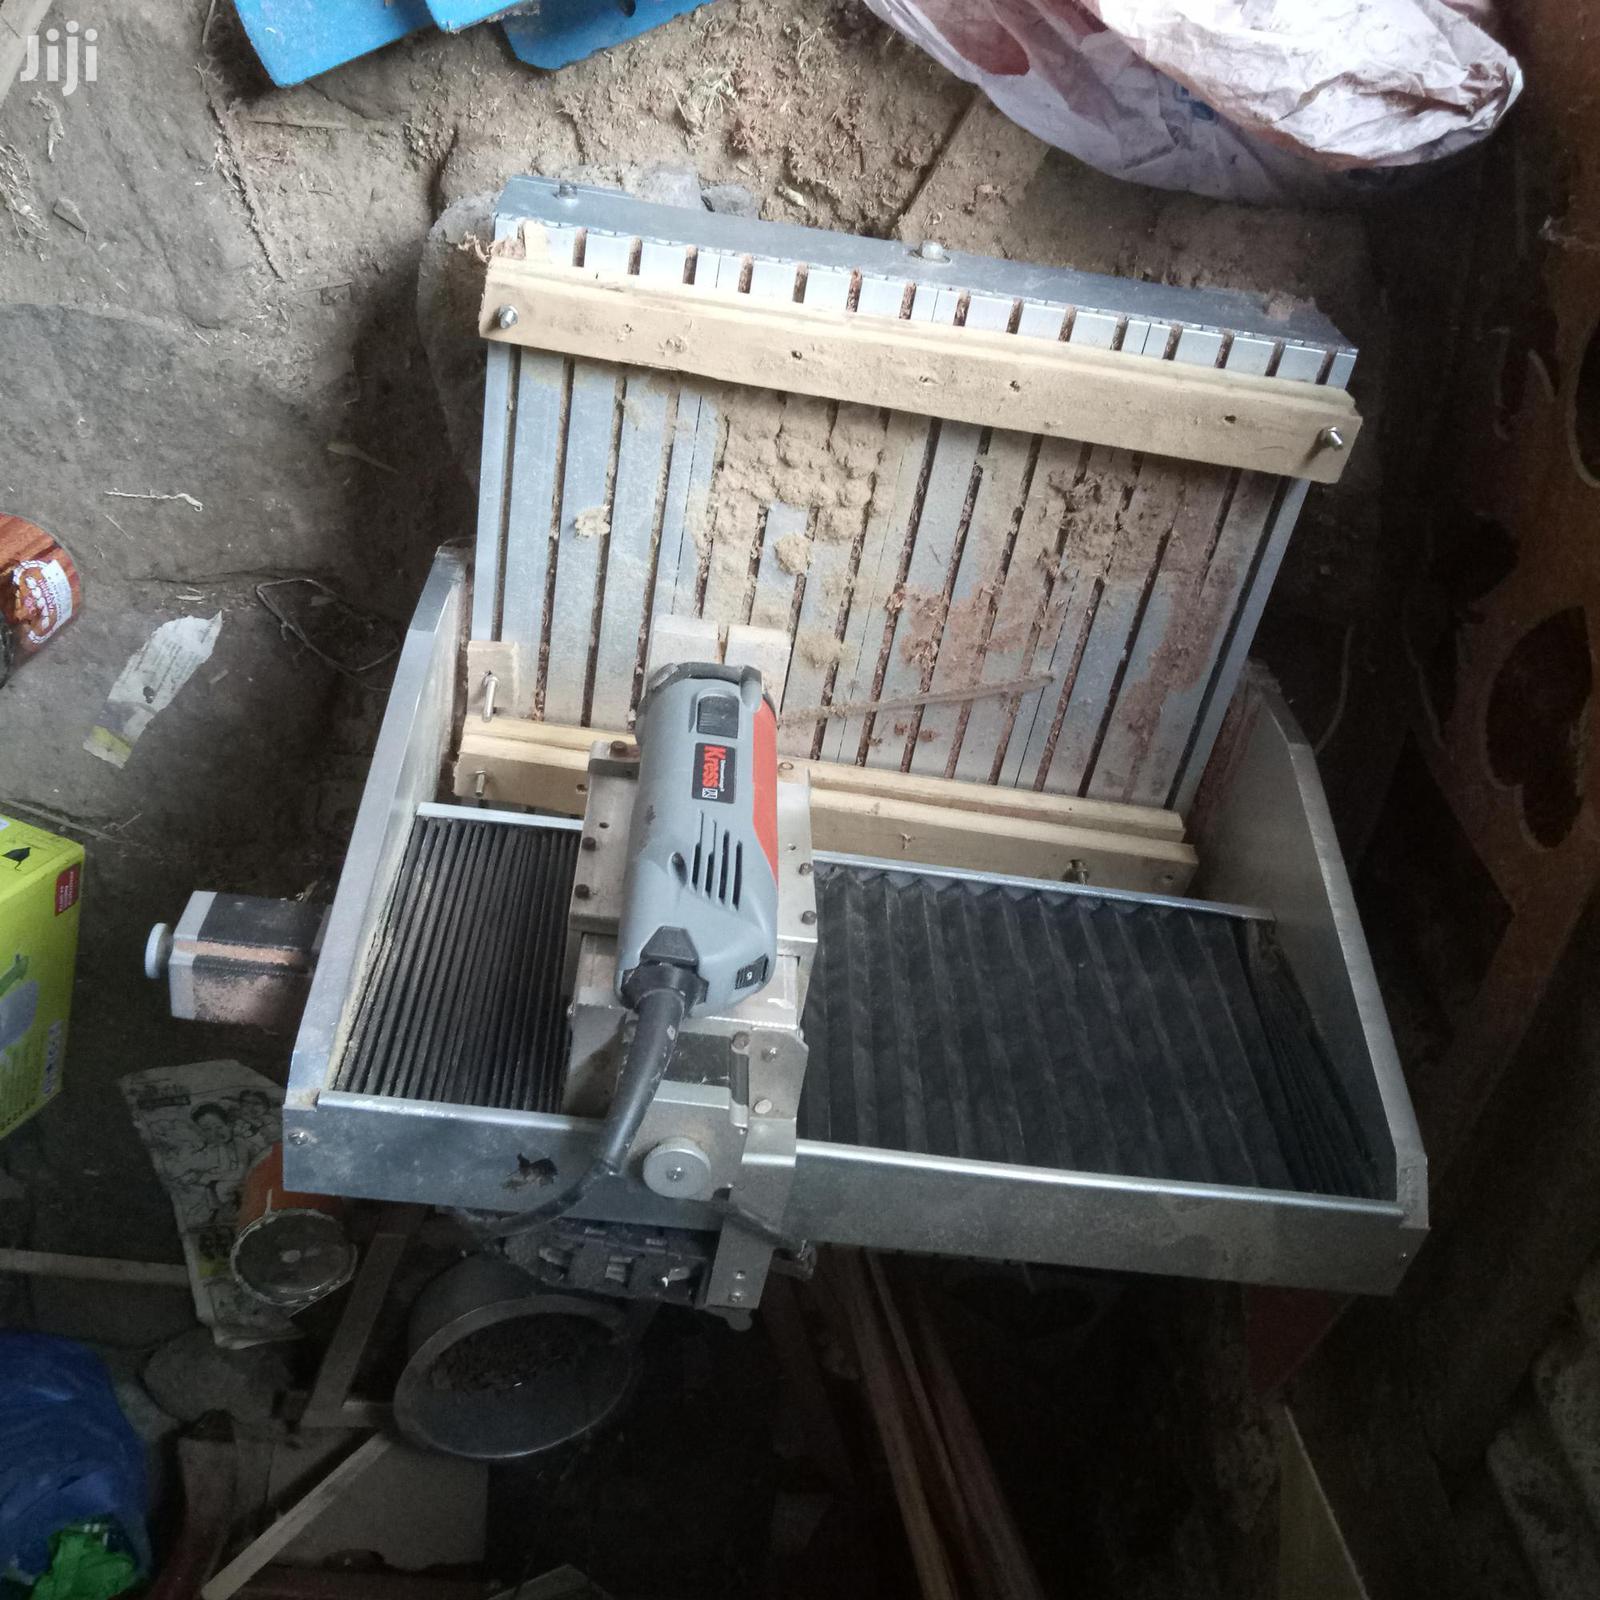 Kress Cnc Machine For Computer Design On Wood Or Mfg